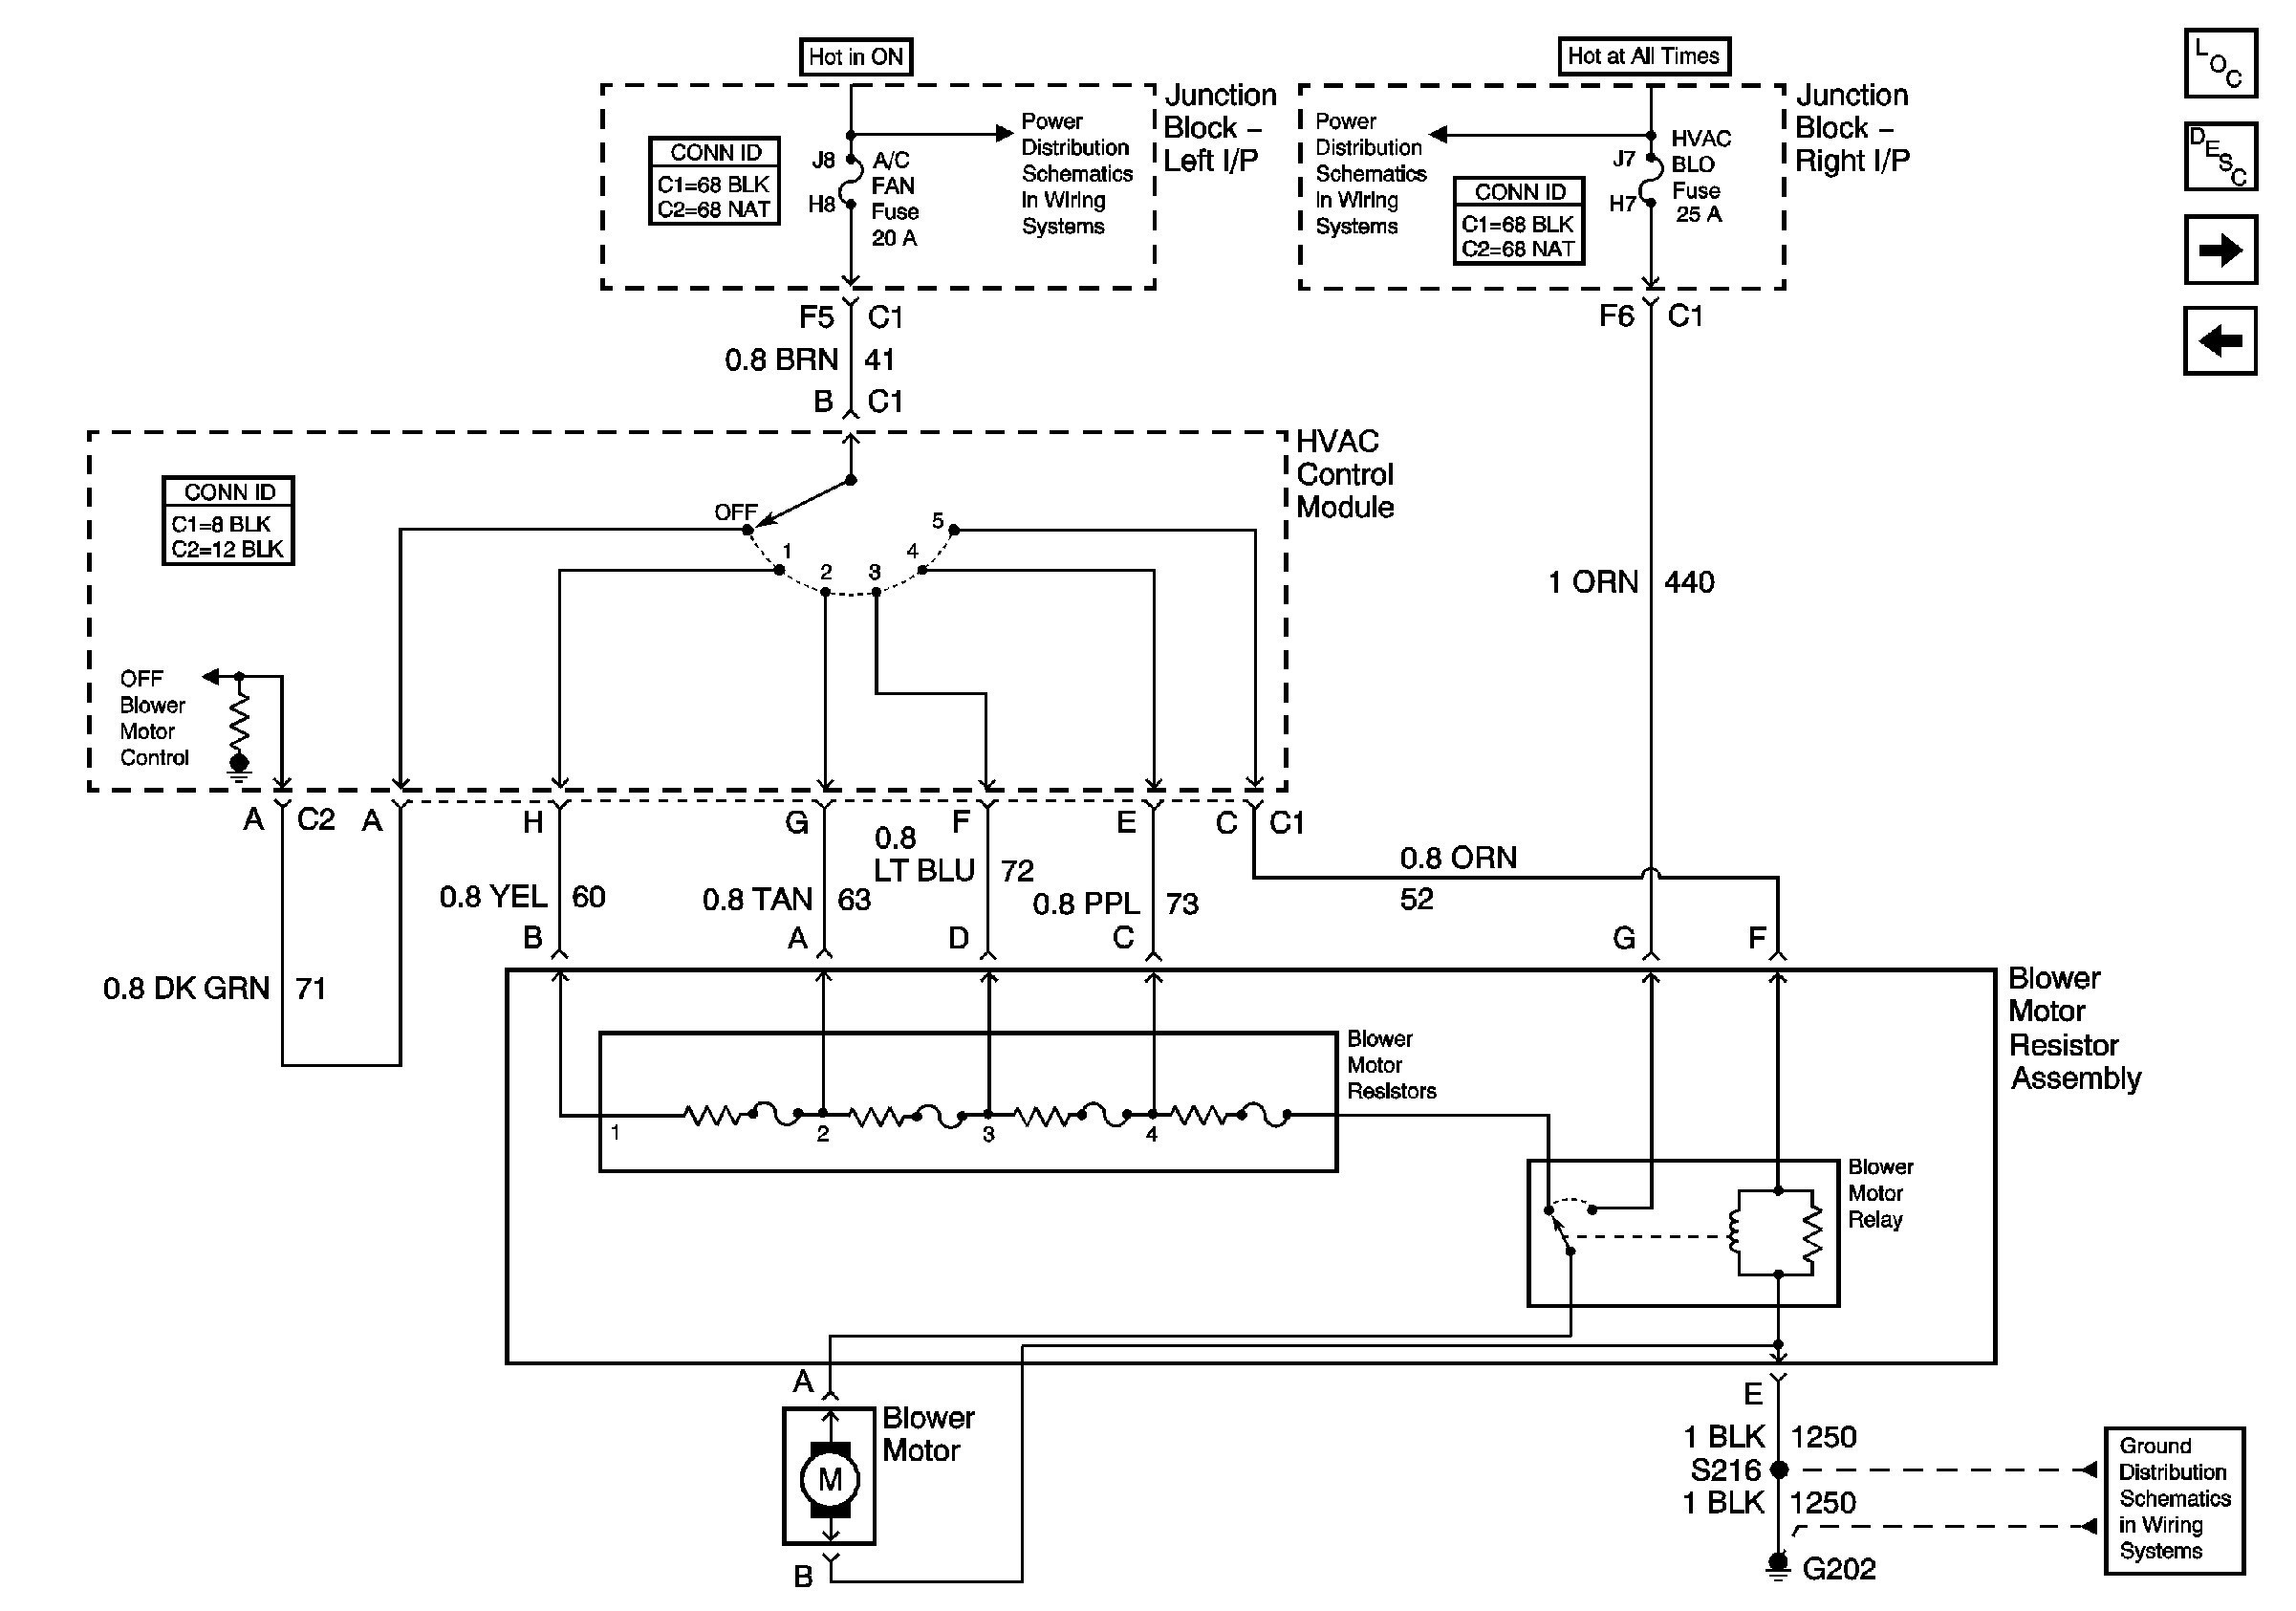 Mars Blower Motor 10587 Wiring Diagram - Smart Wiring Diagrams •